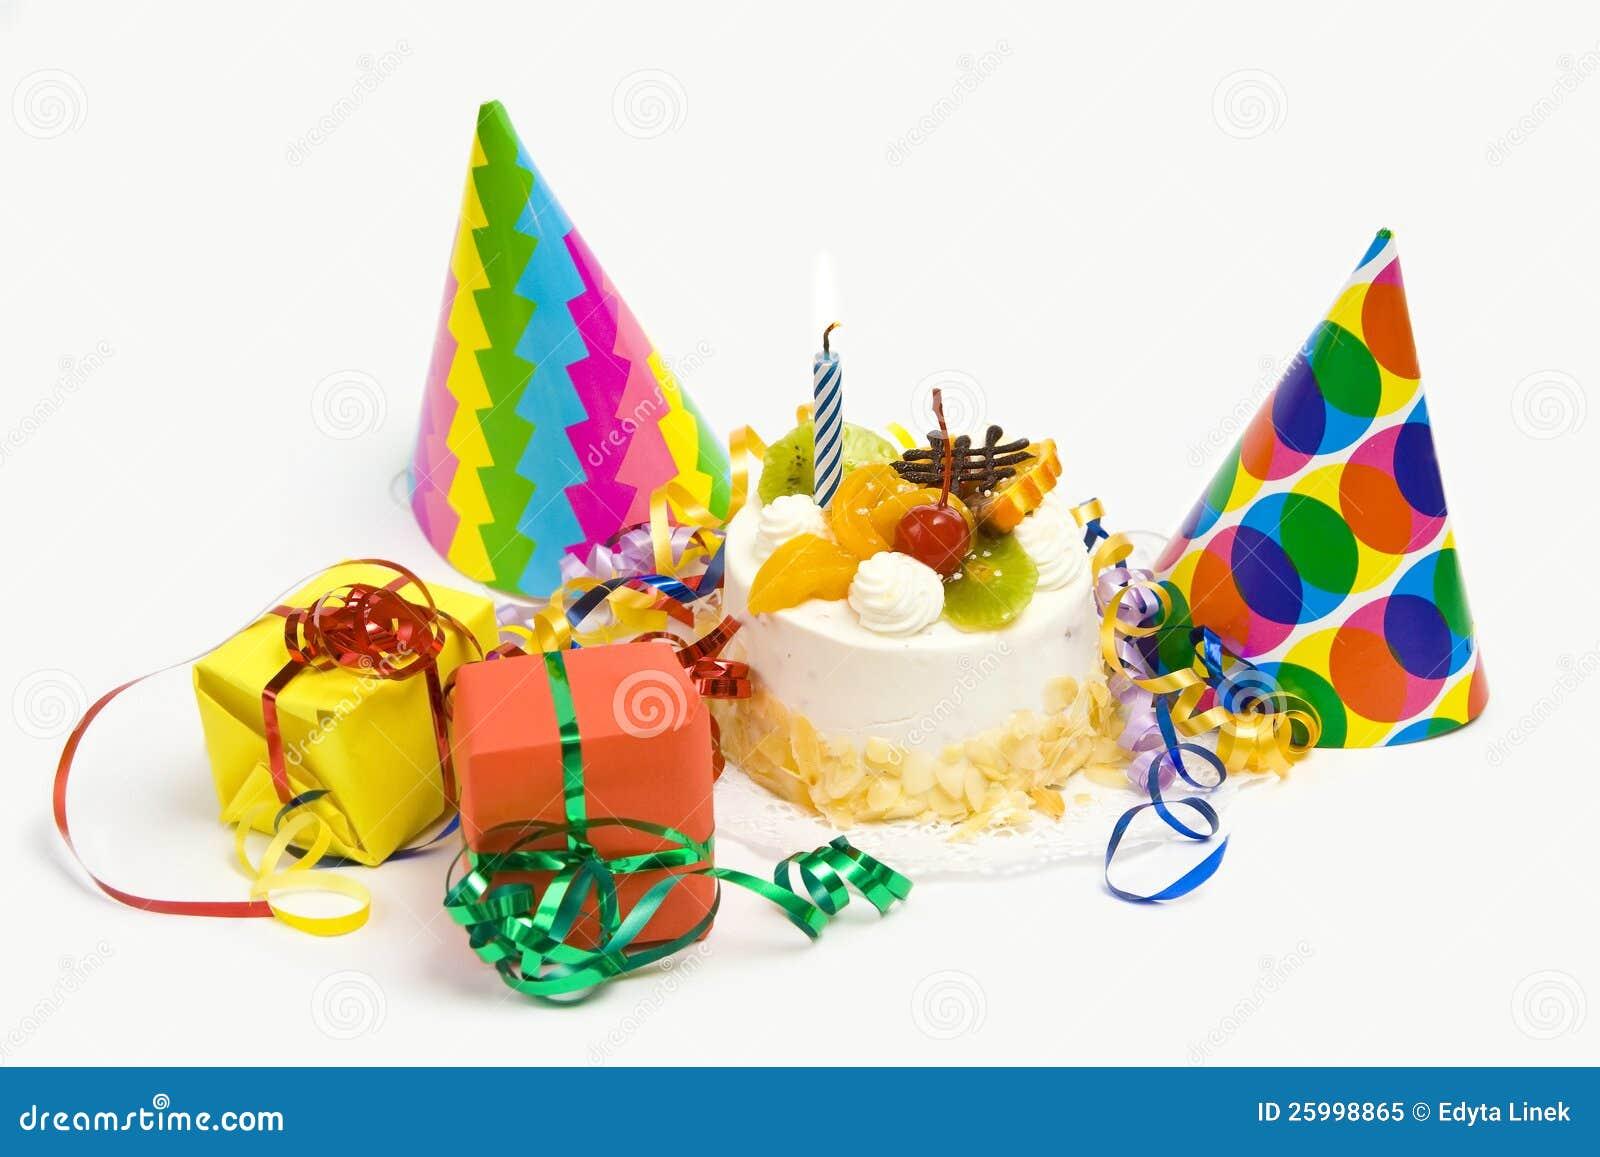 Birthday Cake Royalty Free Stock Photo - Image: 25998865